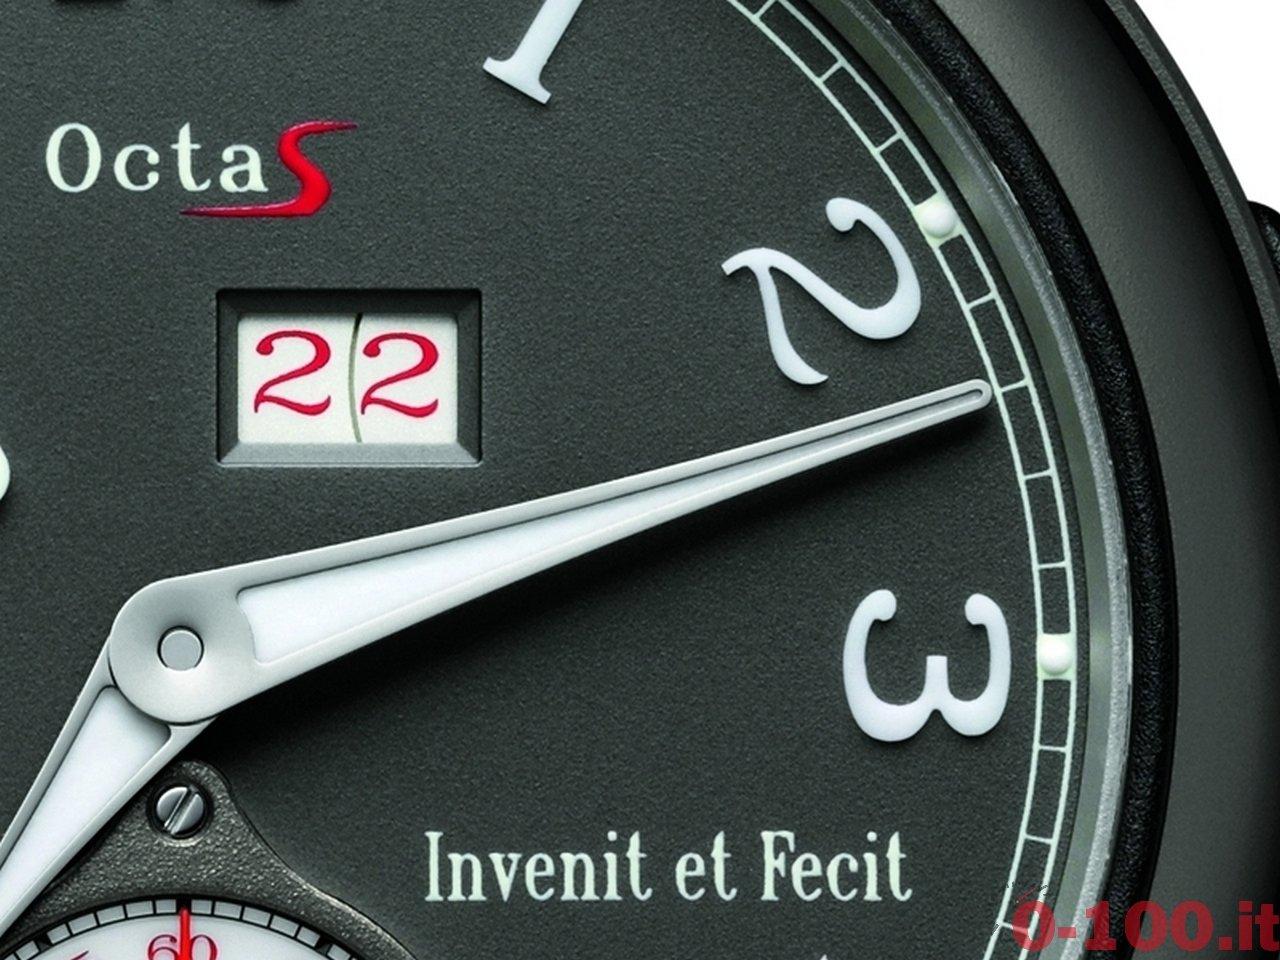 f-p-journe-octa-sport-titanium-prezzo-price-0-100_5